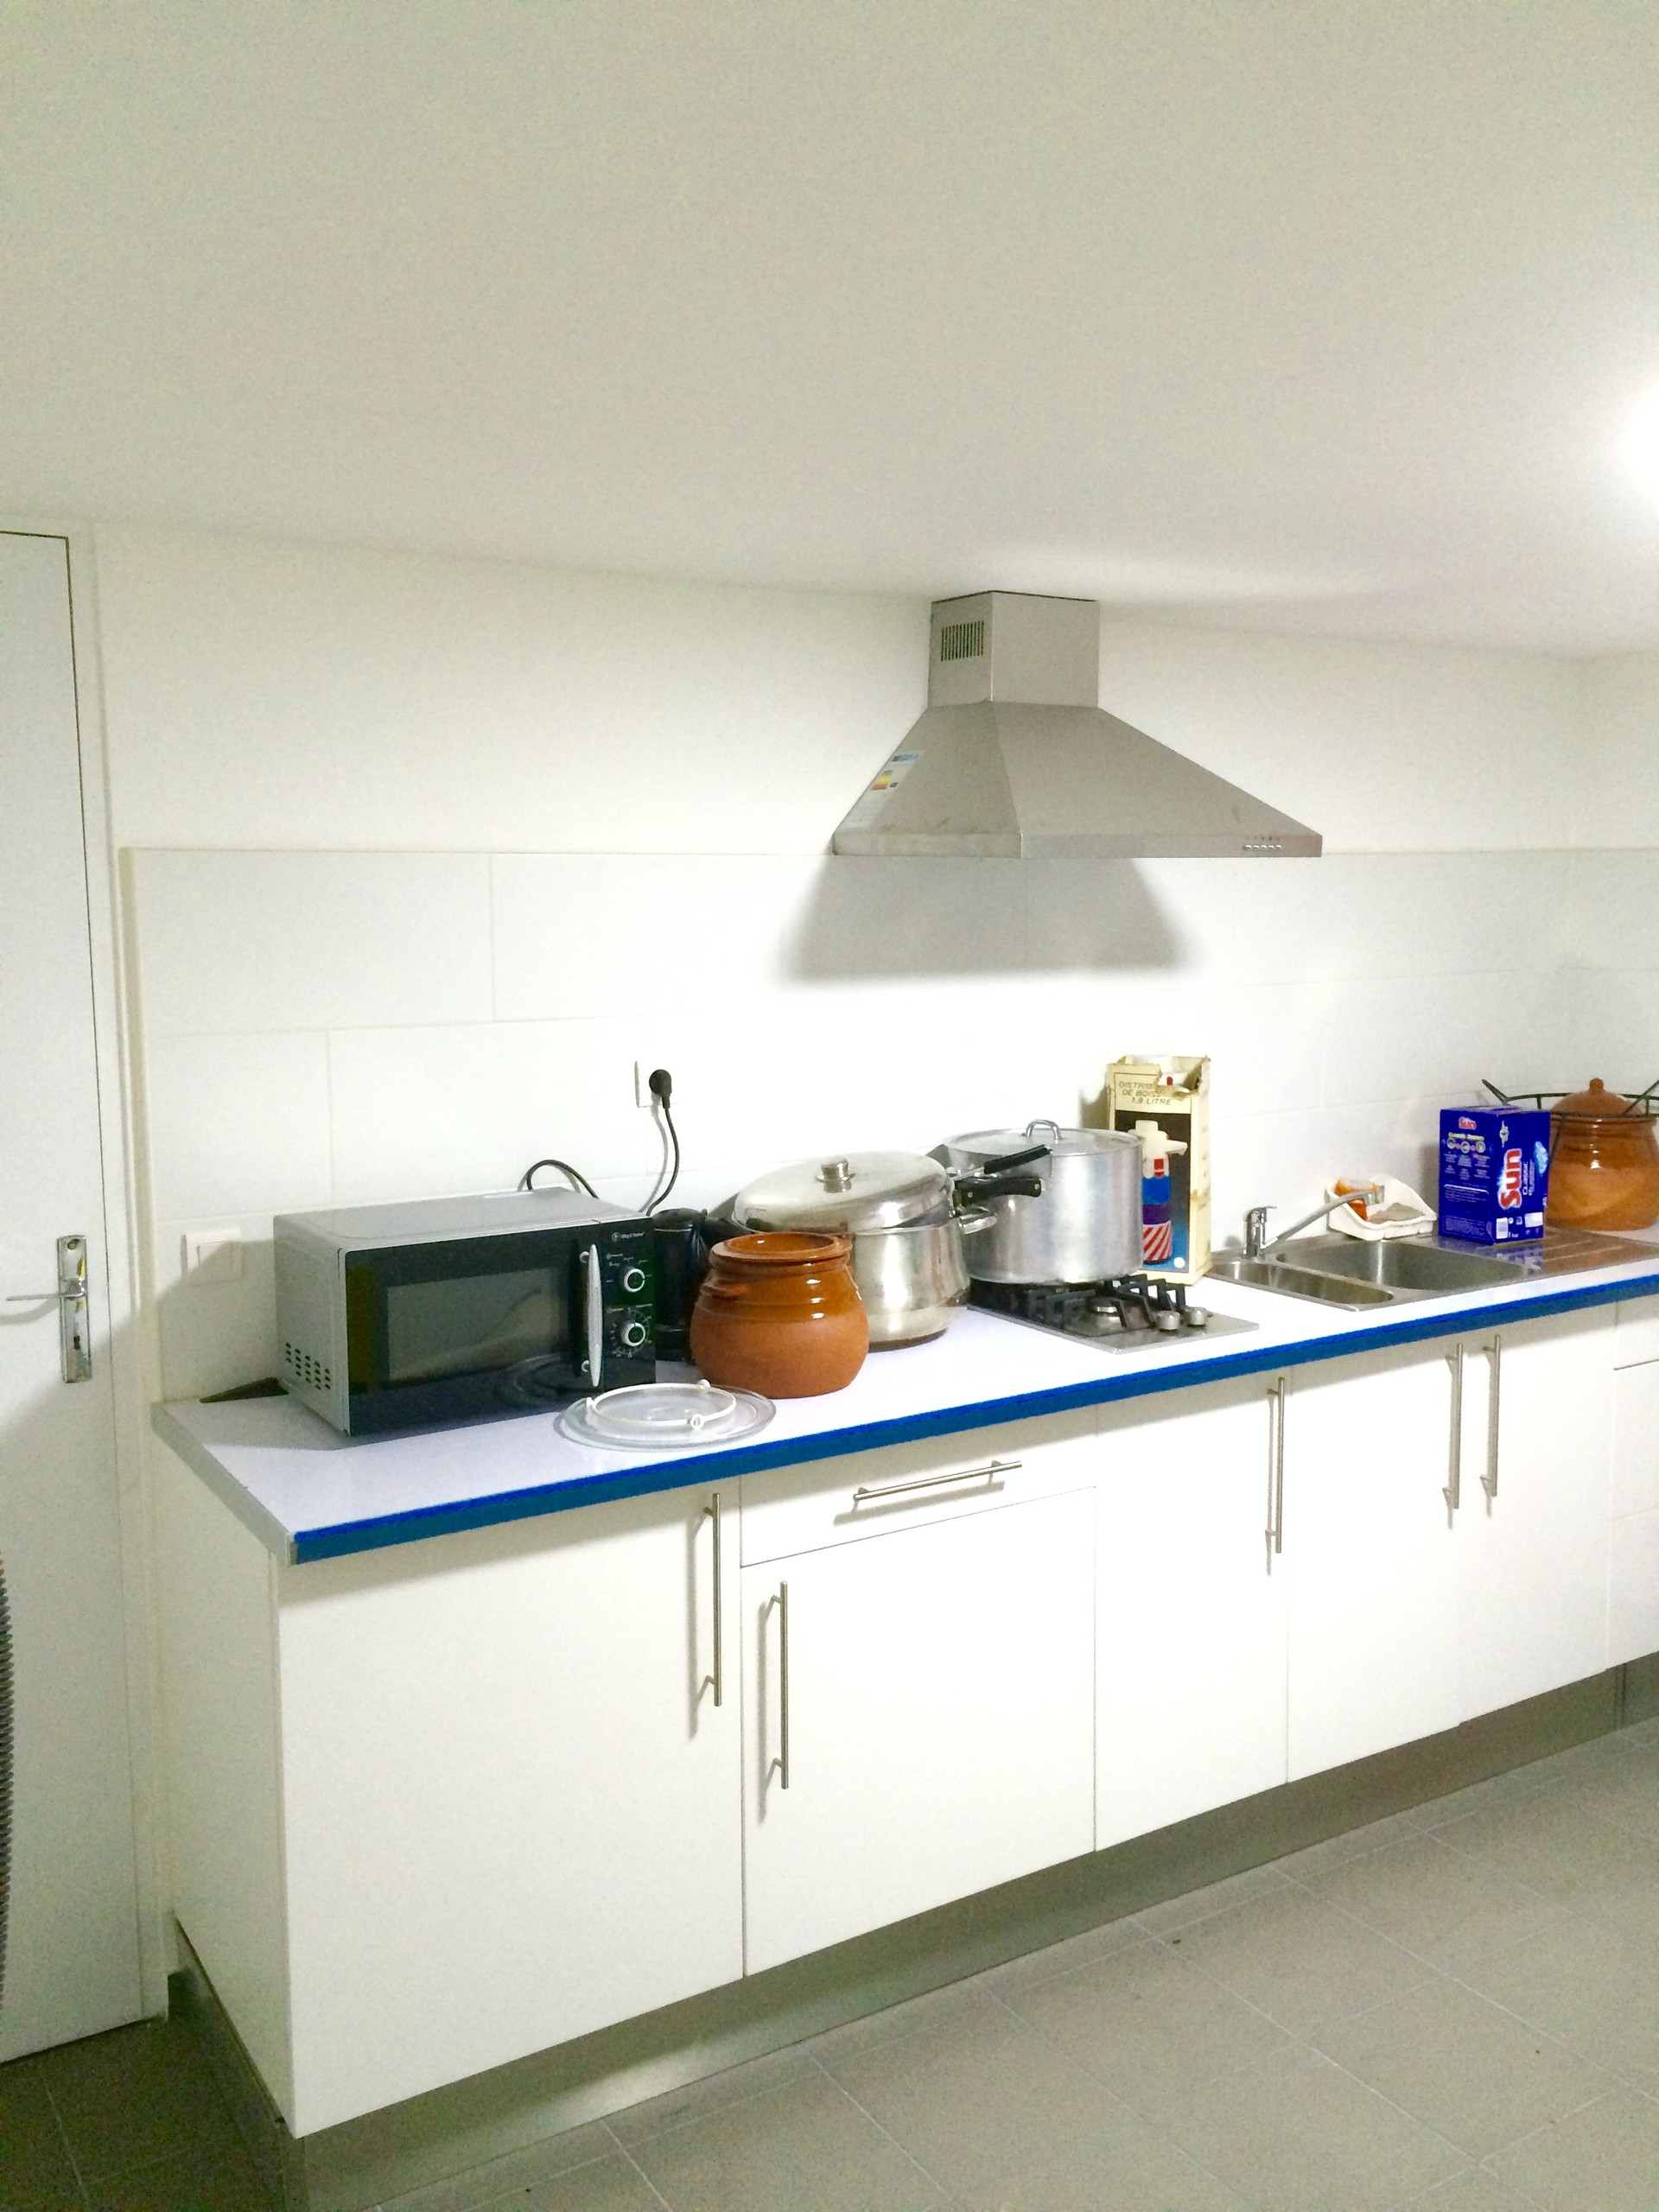 Paris : Bedroom Bathroom Kitchen In Paris | Rent studios Paris